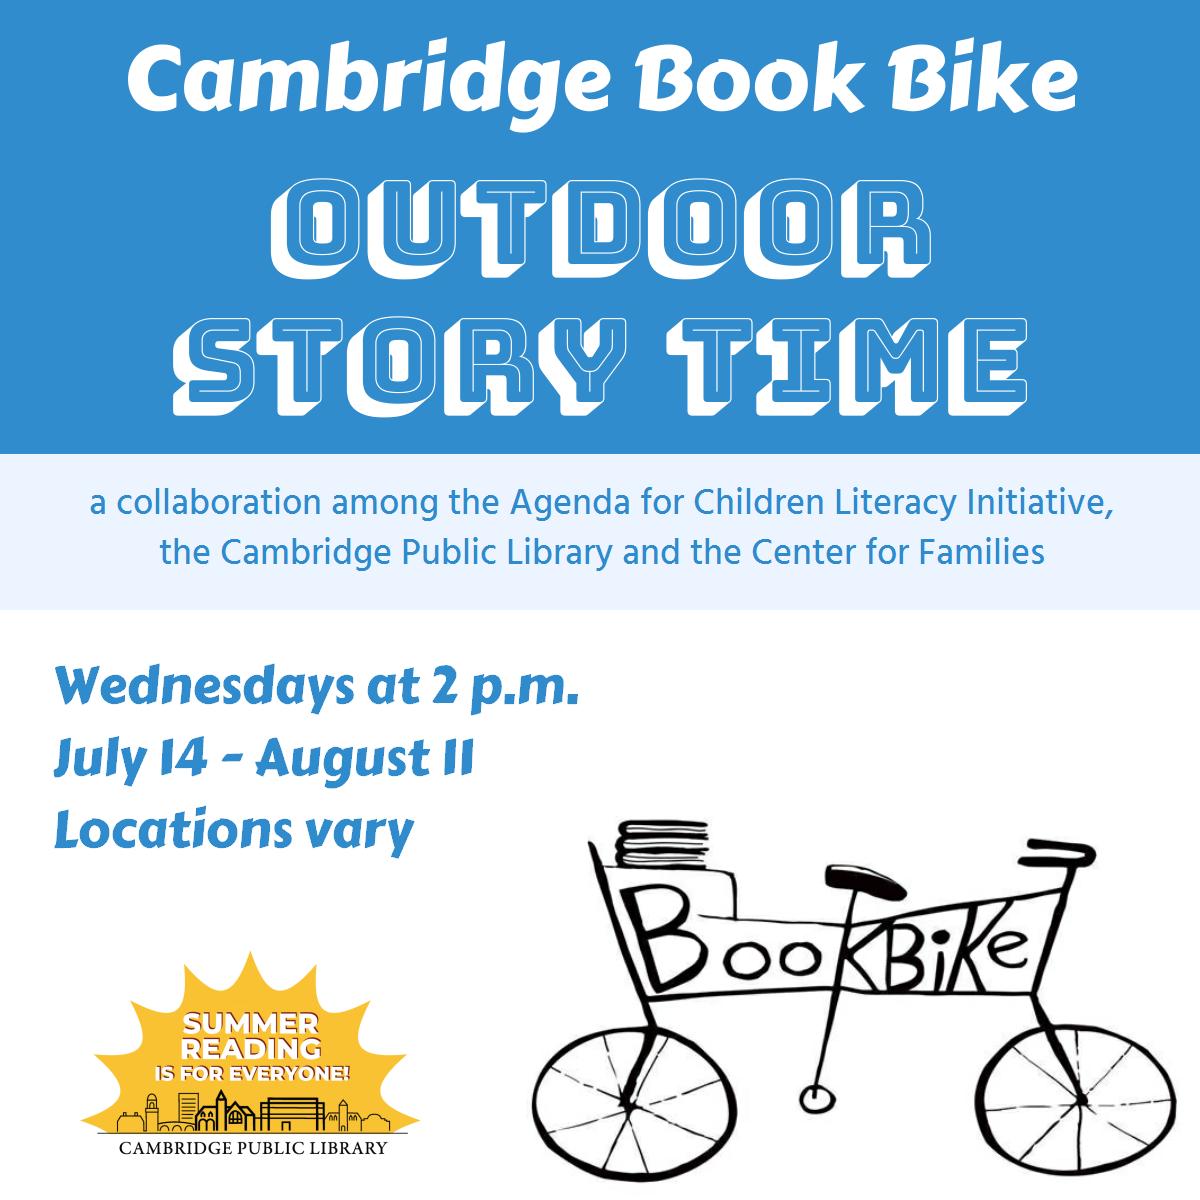 Cambridge Book Bike Story Time